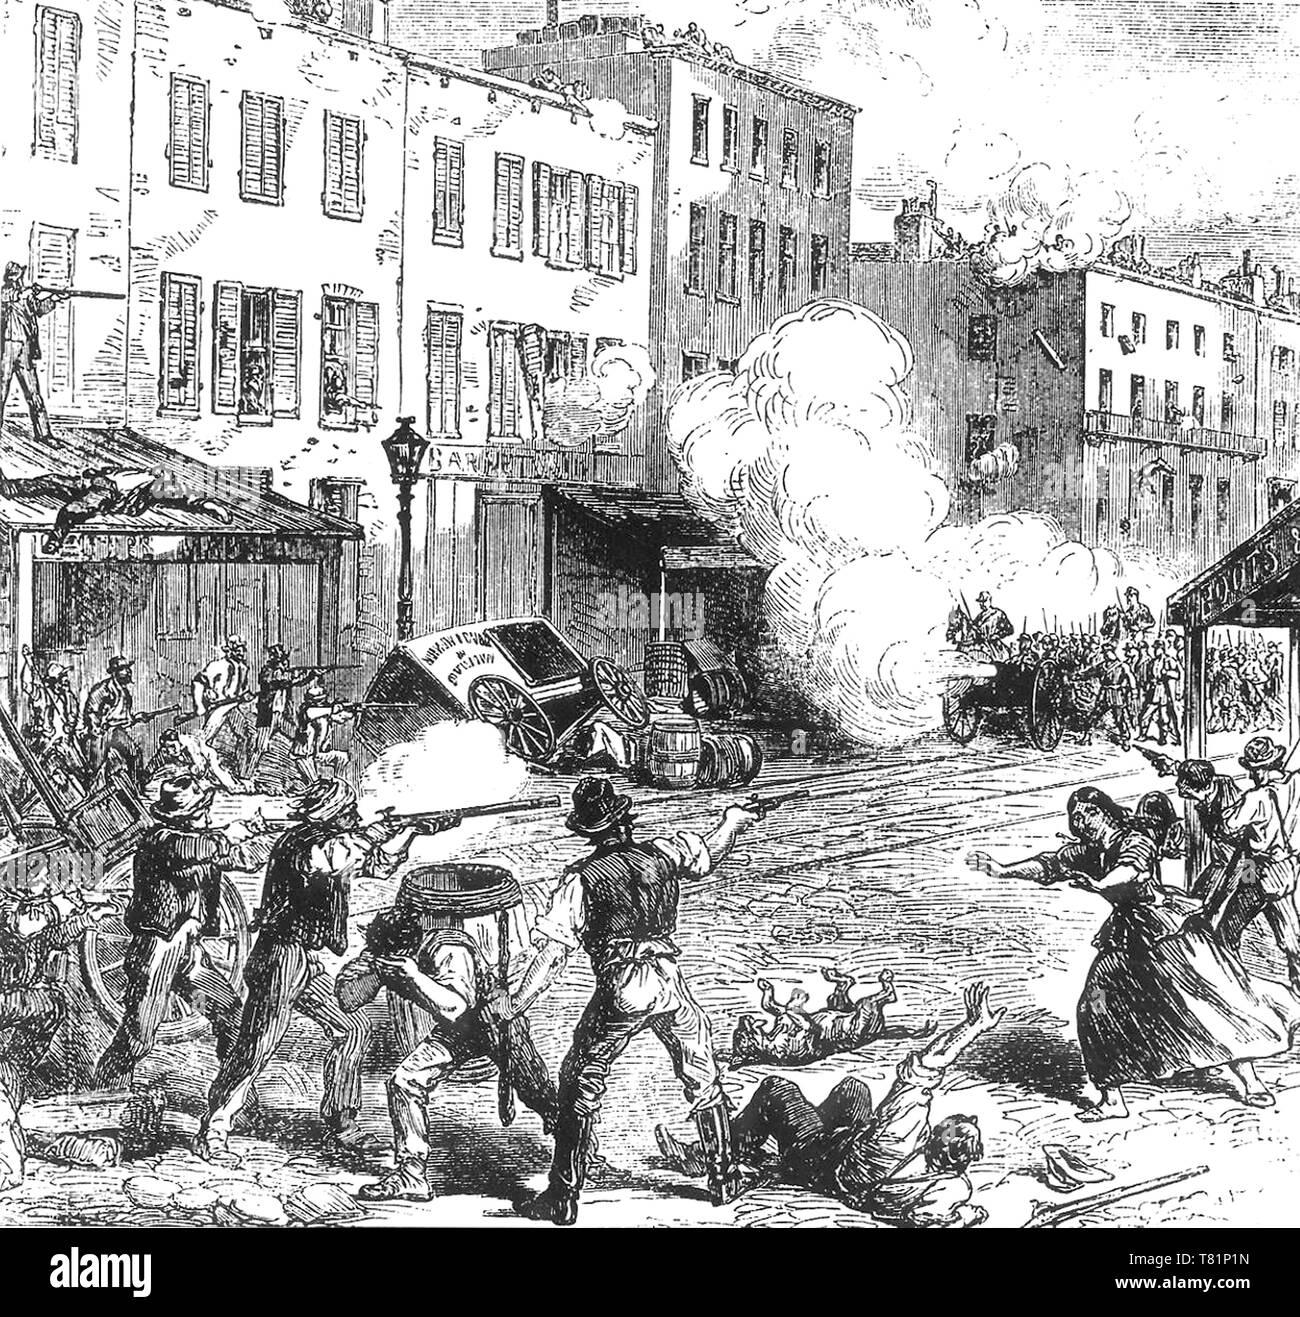 New York City Draft Riots, 1863 Stock Photo